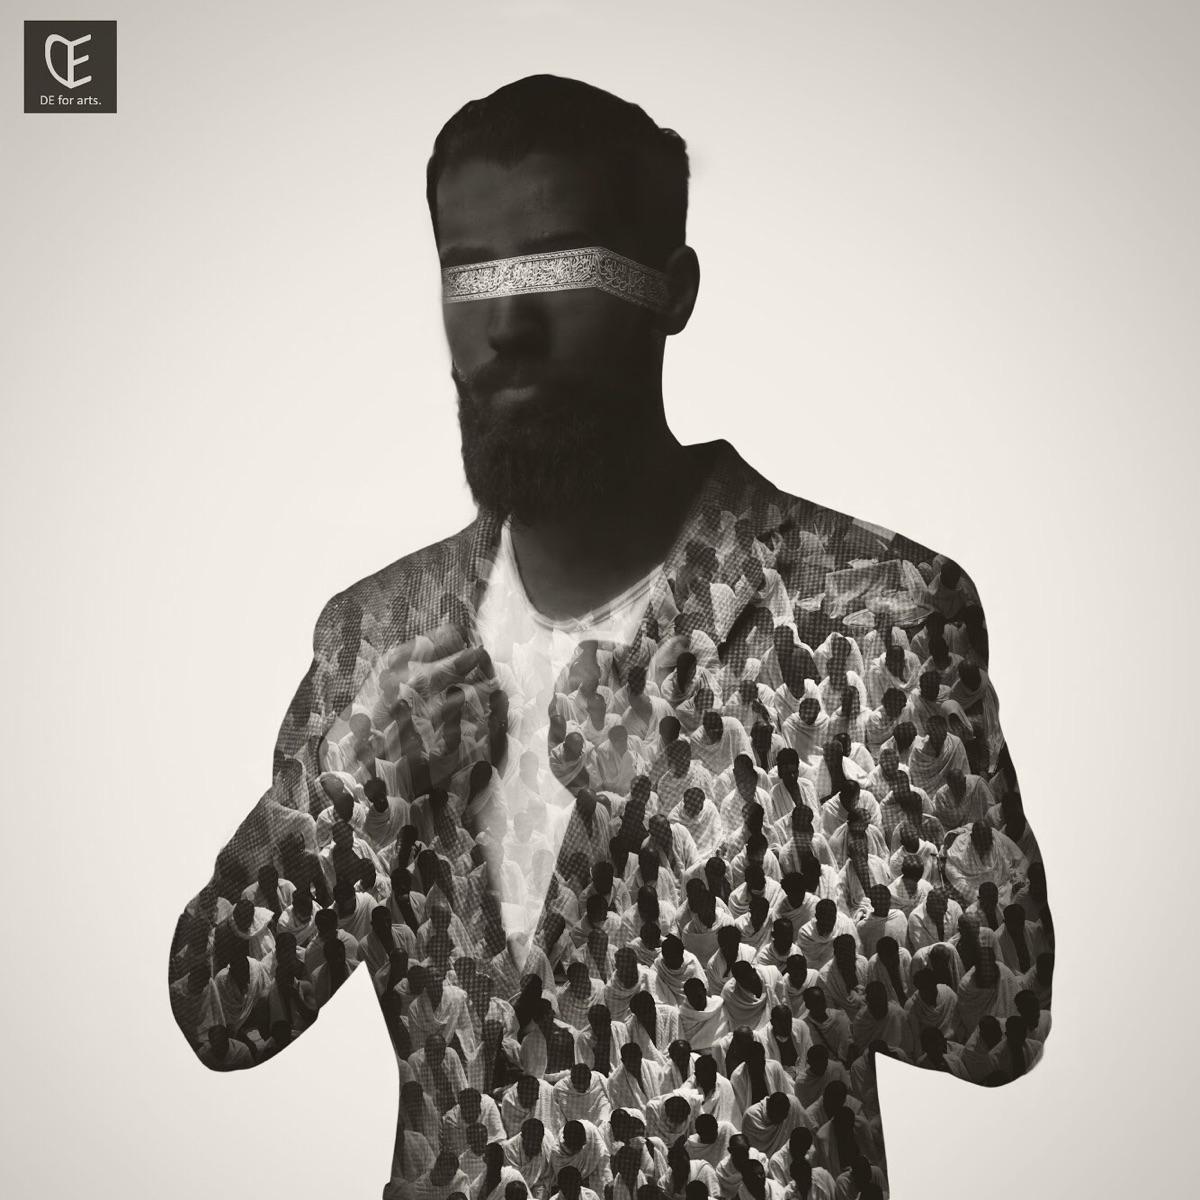 أحمد النعيم (@al_lobby) Cover Image